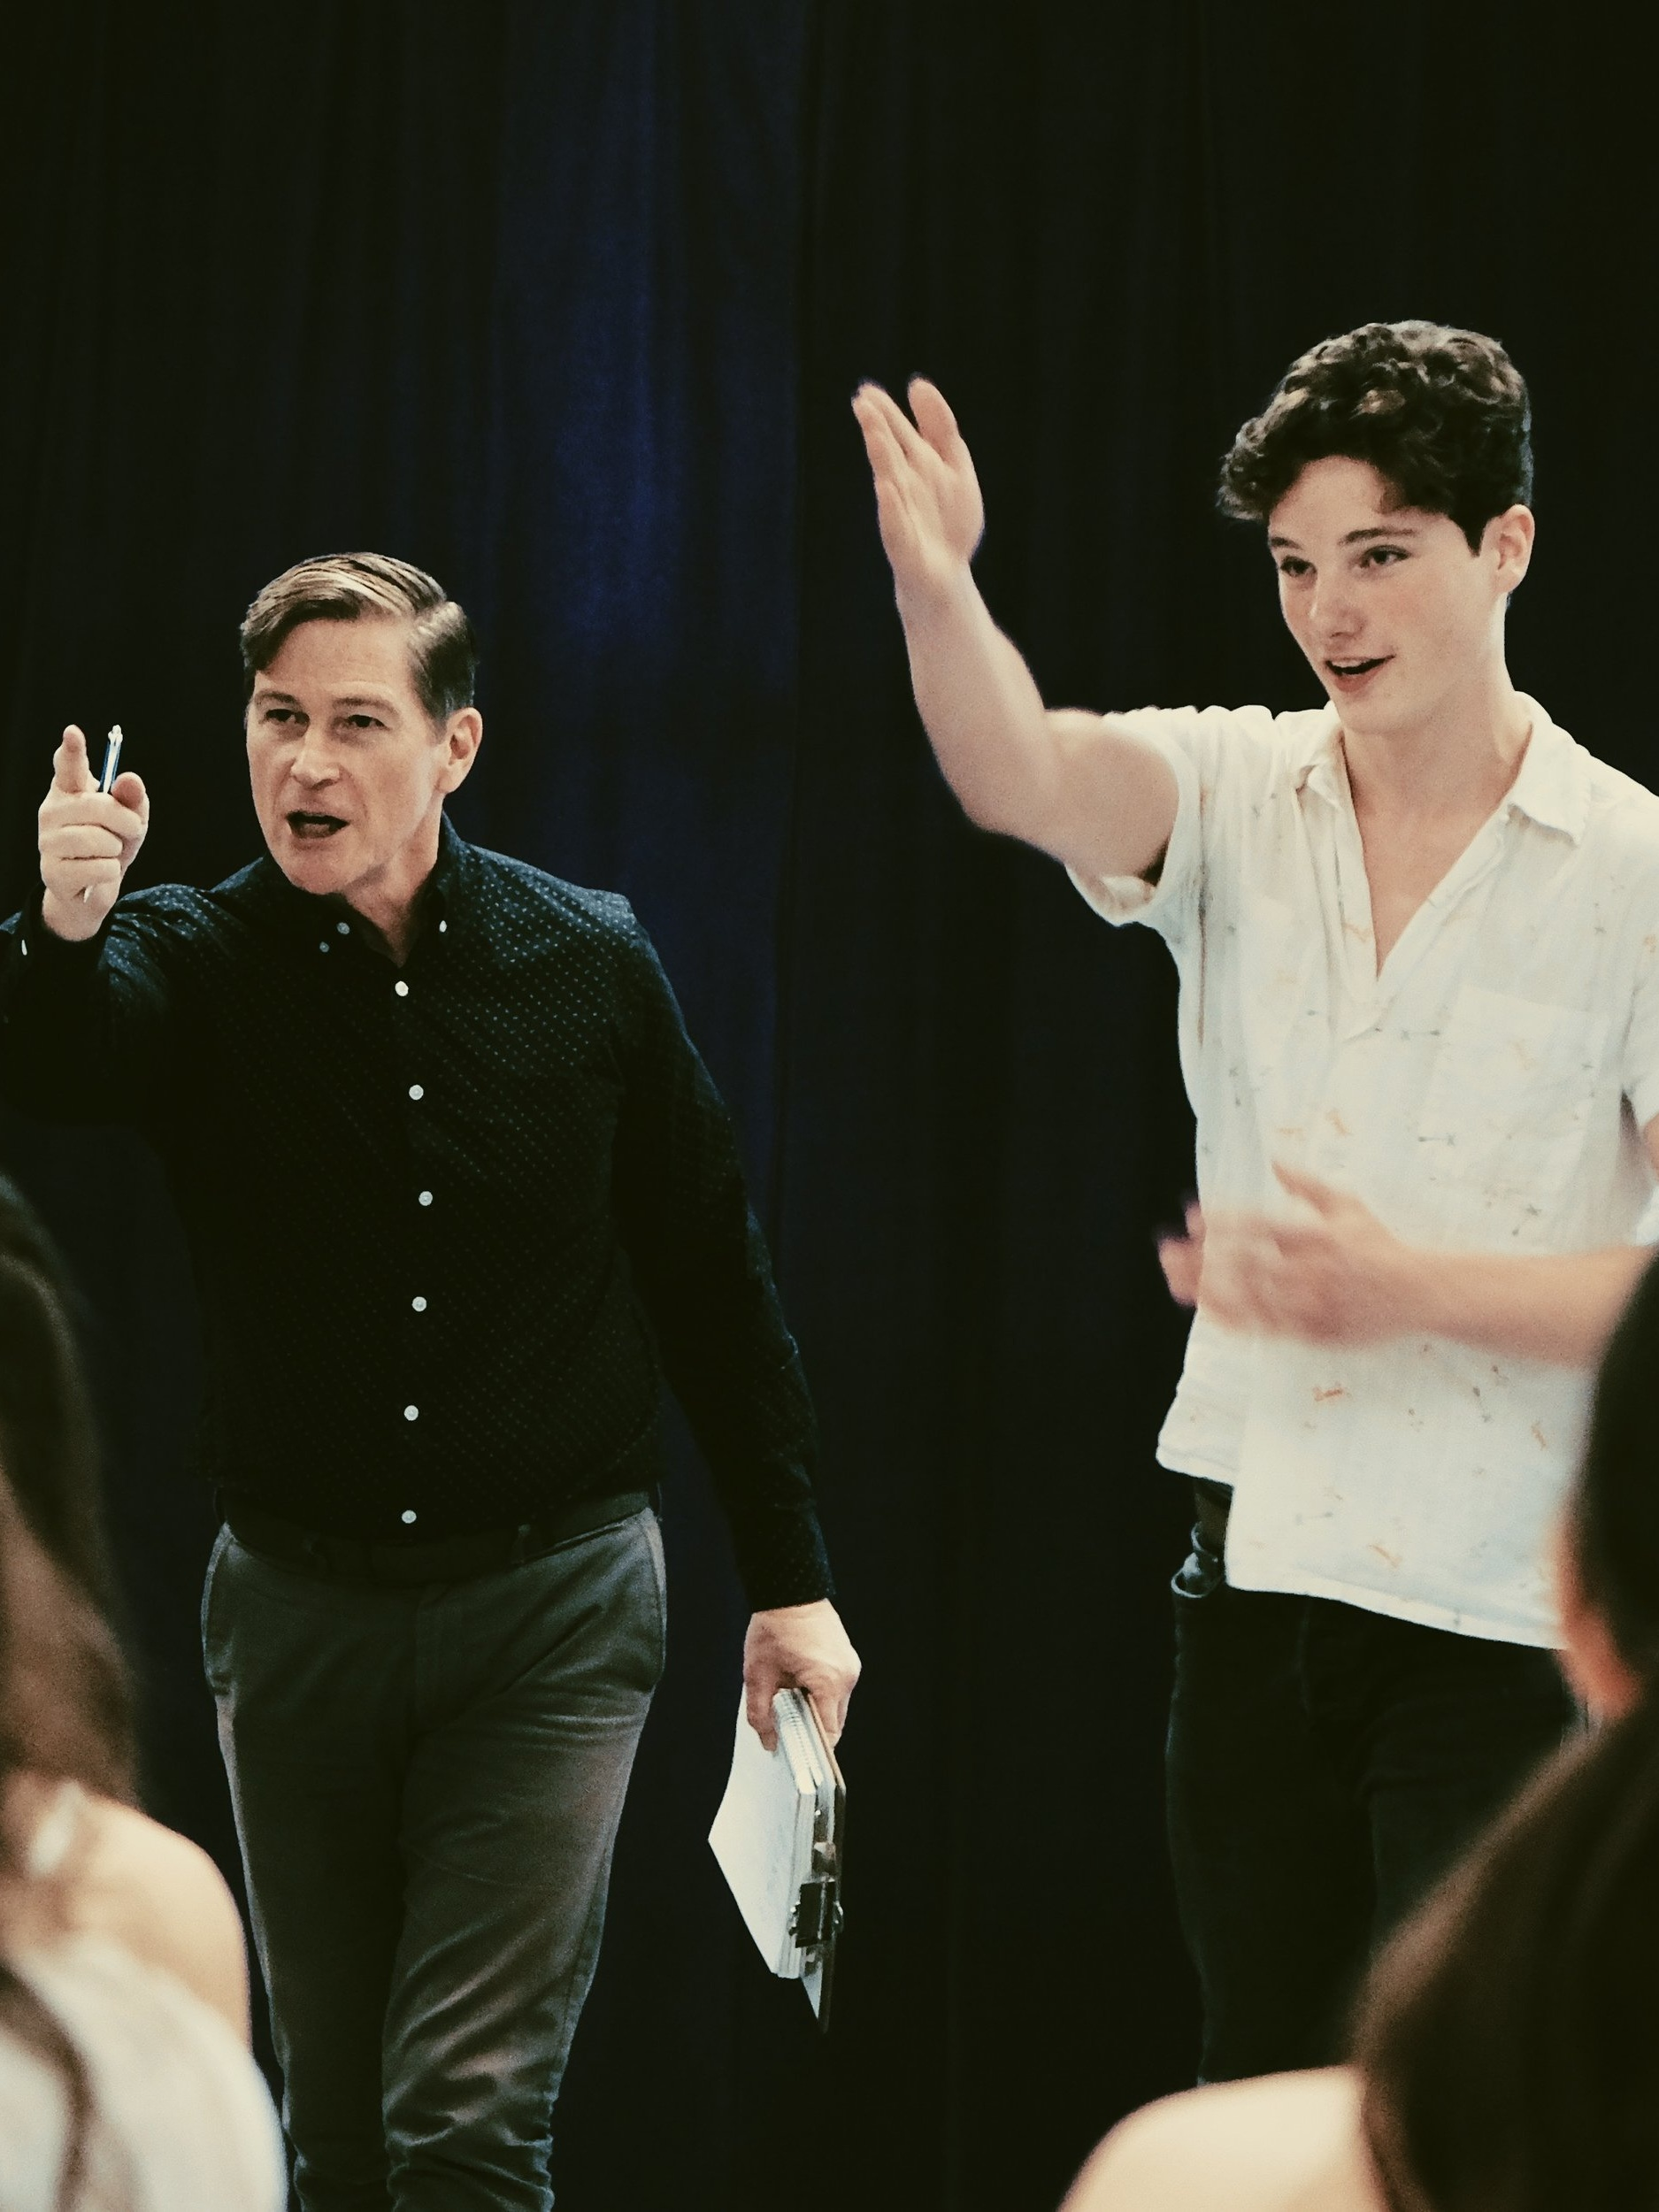 Graham pointing.JPG